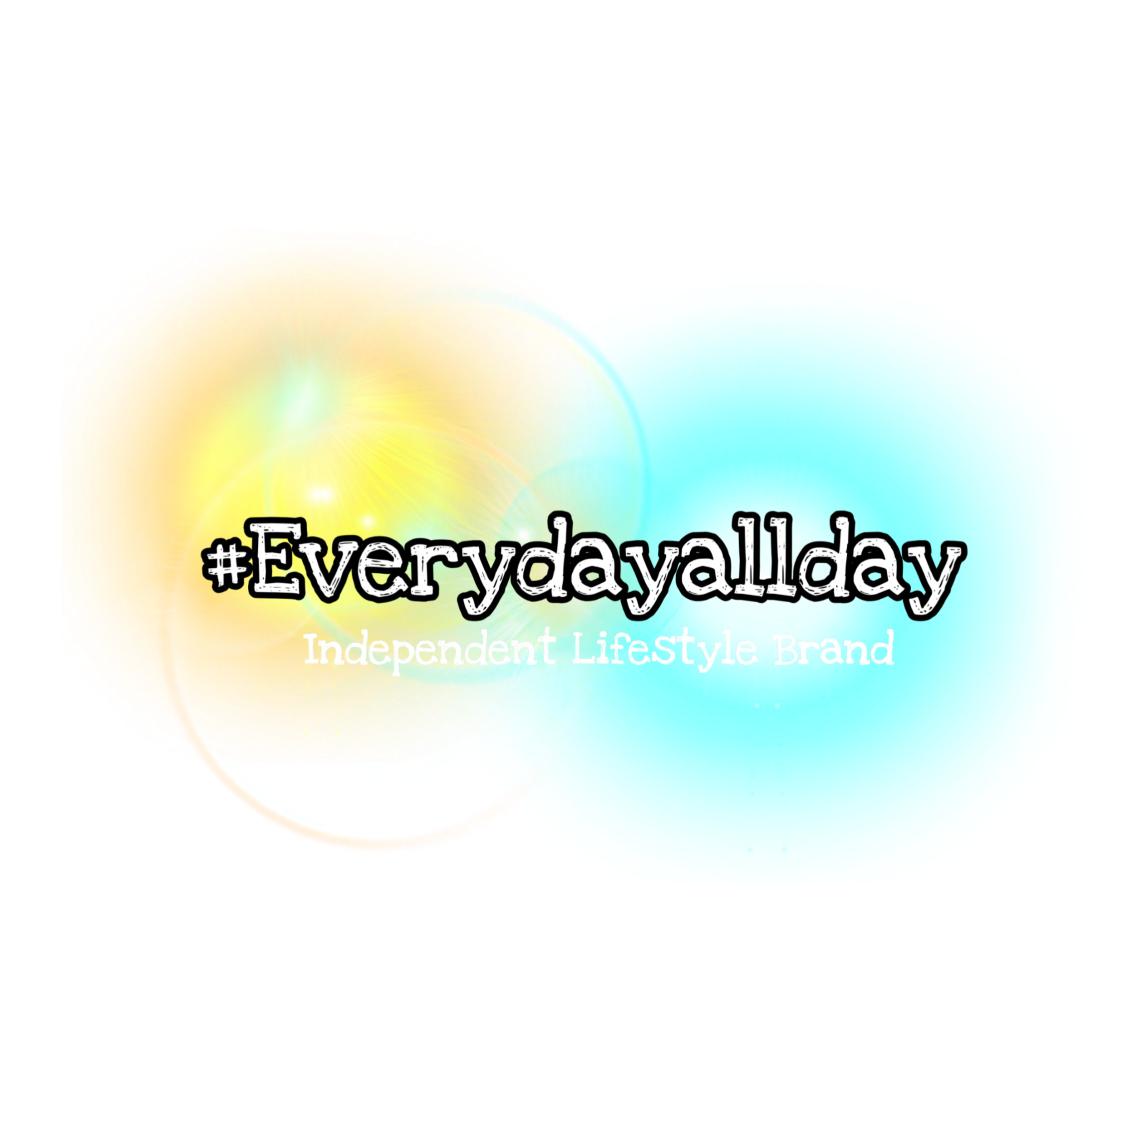 Everydayallday -Independent Lifestyle Brand